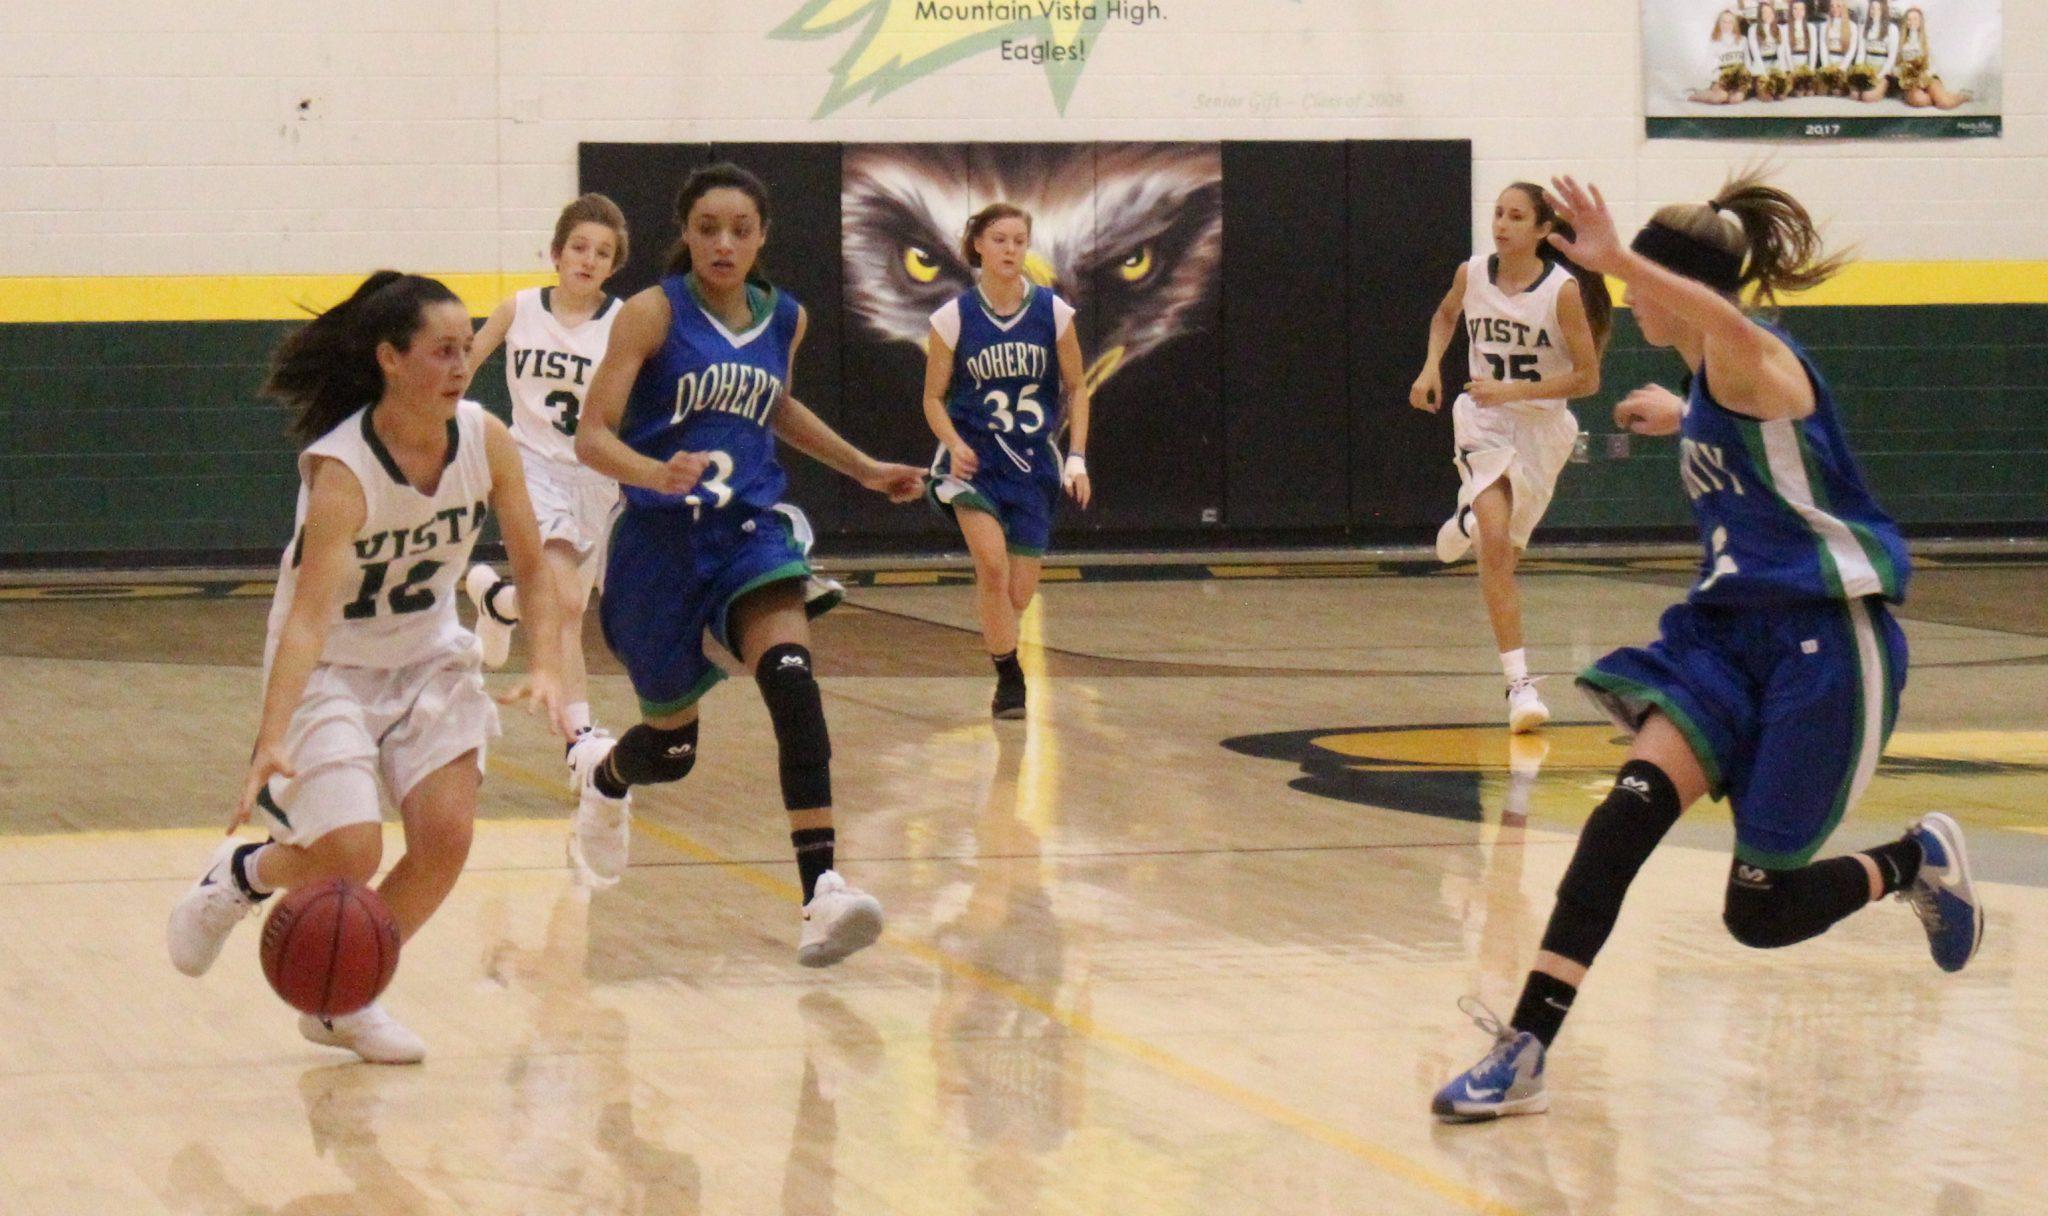 Photo Gallery: Women's Sophomore Basketball vs. Doherty High School